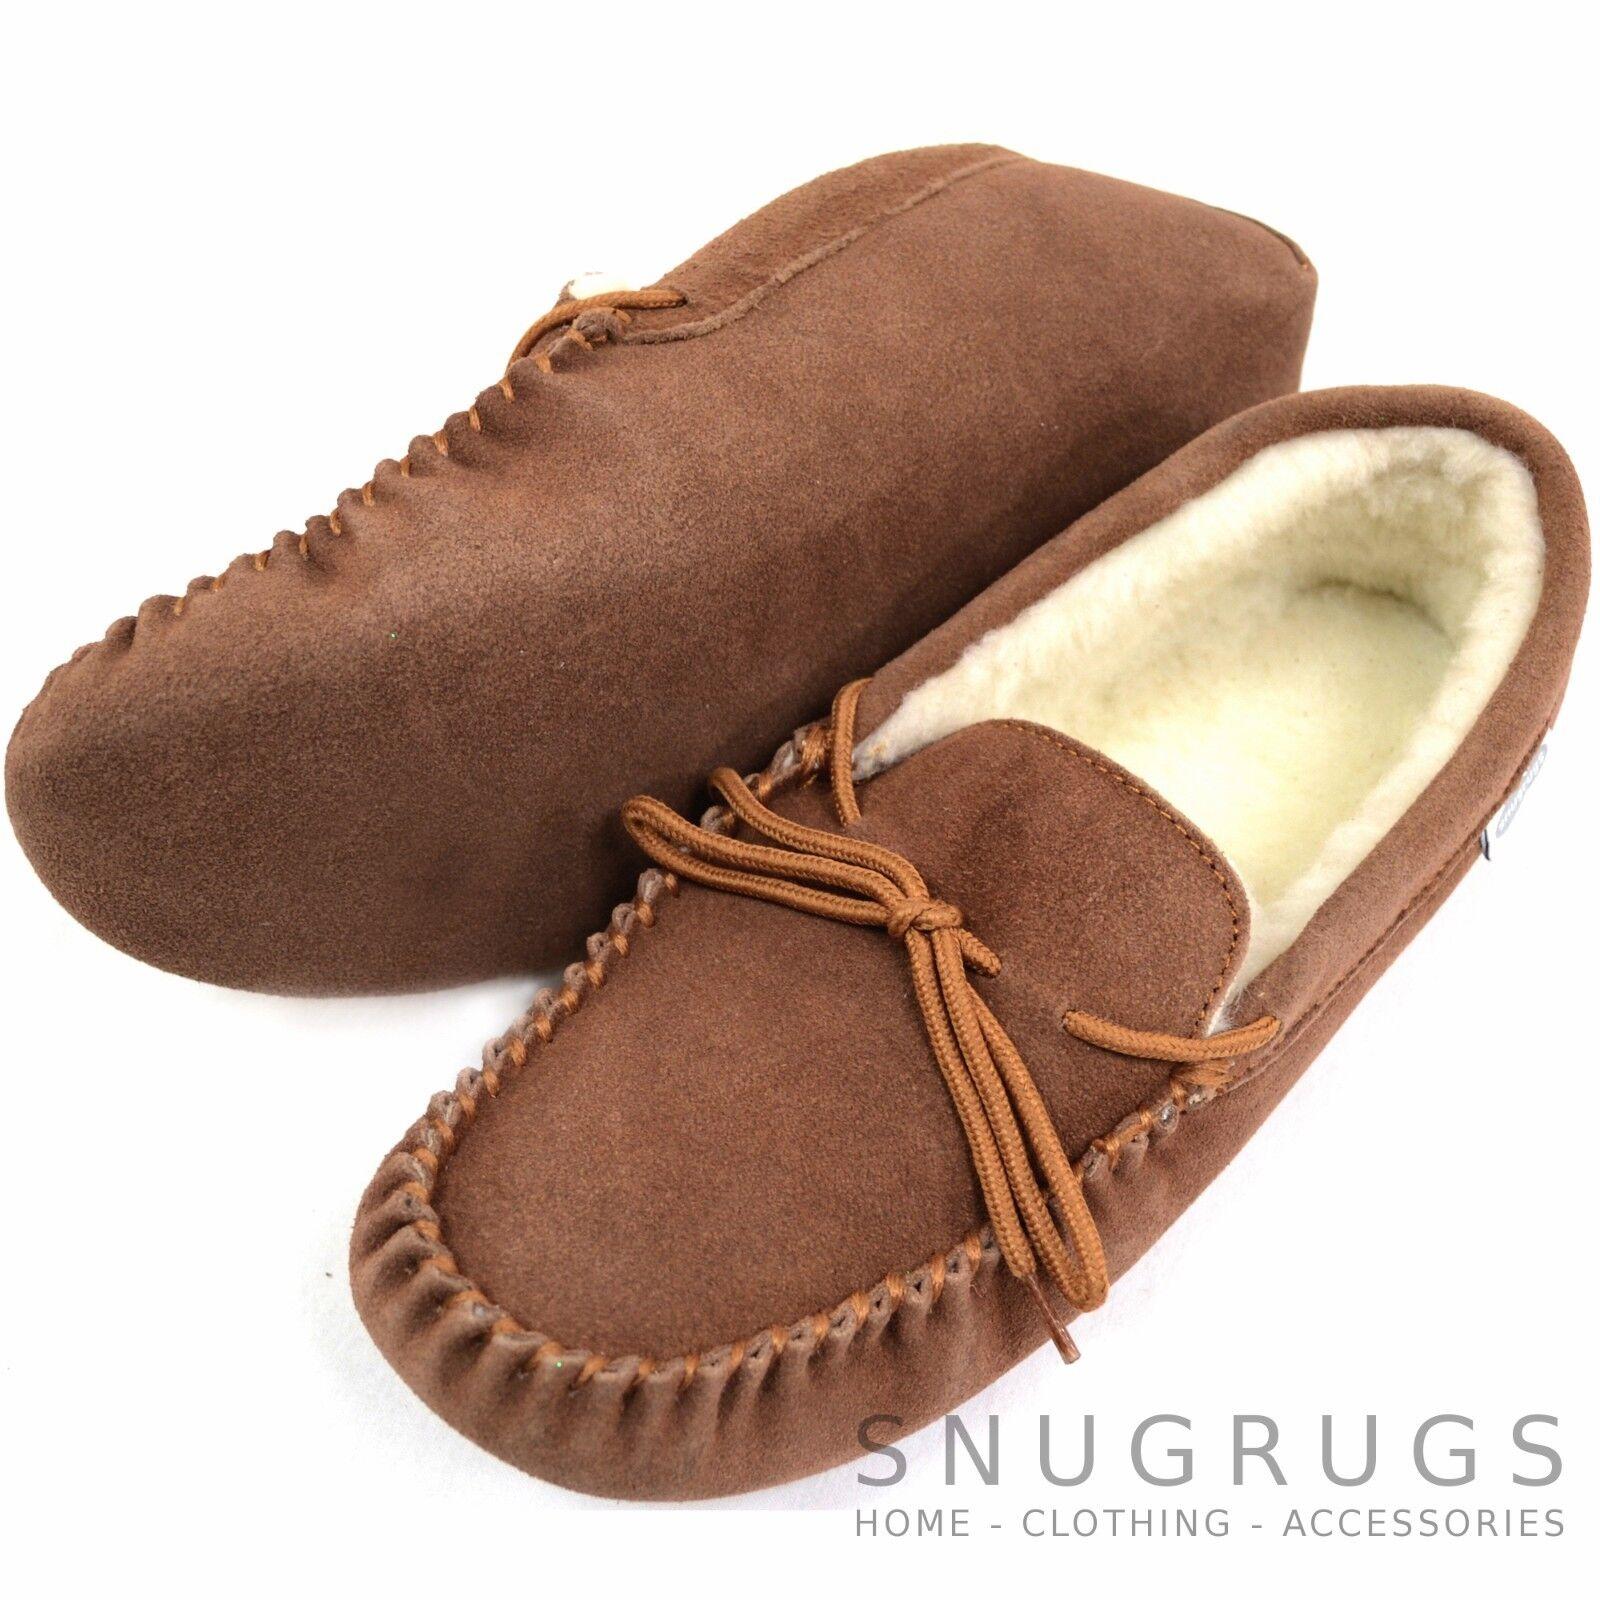 Snugrugs da Pantofole Uomo Originali Mocassino Scamosciato Pantofole da pelle di Pecora 636190